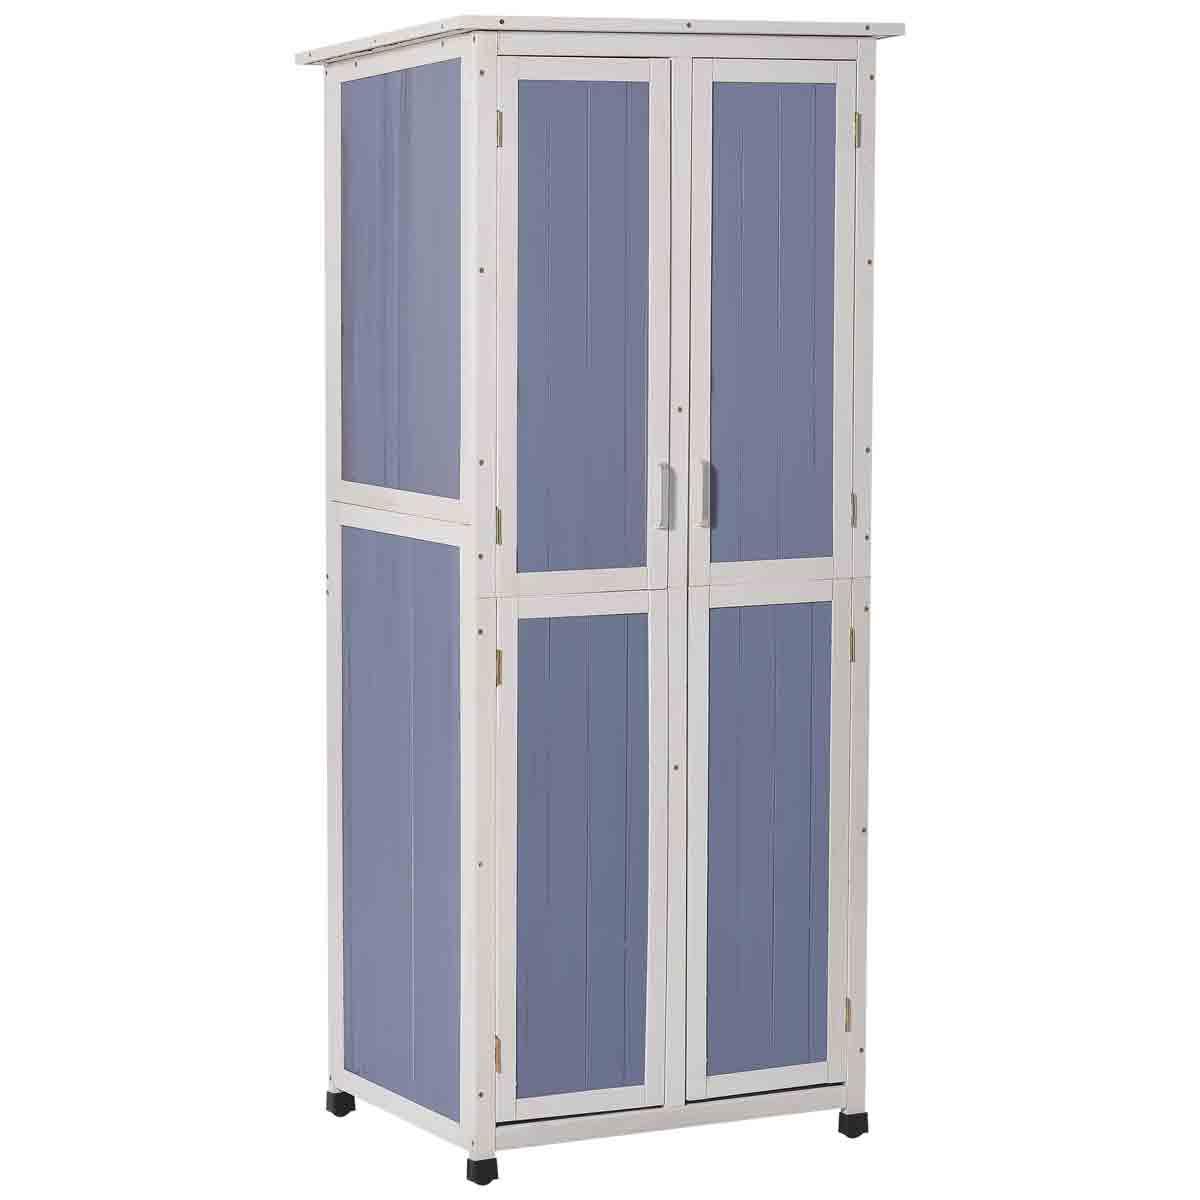 Outsunny 2' 6'' x 1' 10'' Wooden 3-Tier Garden Storage Cabinet - Blue